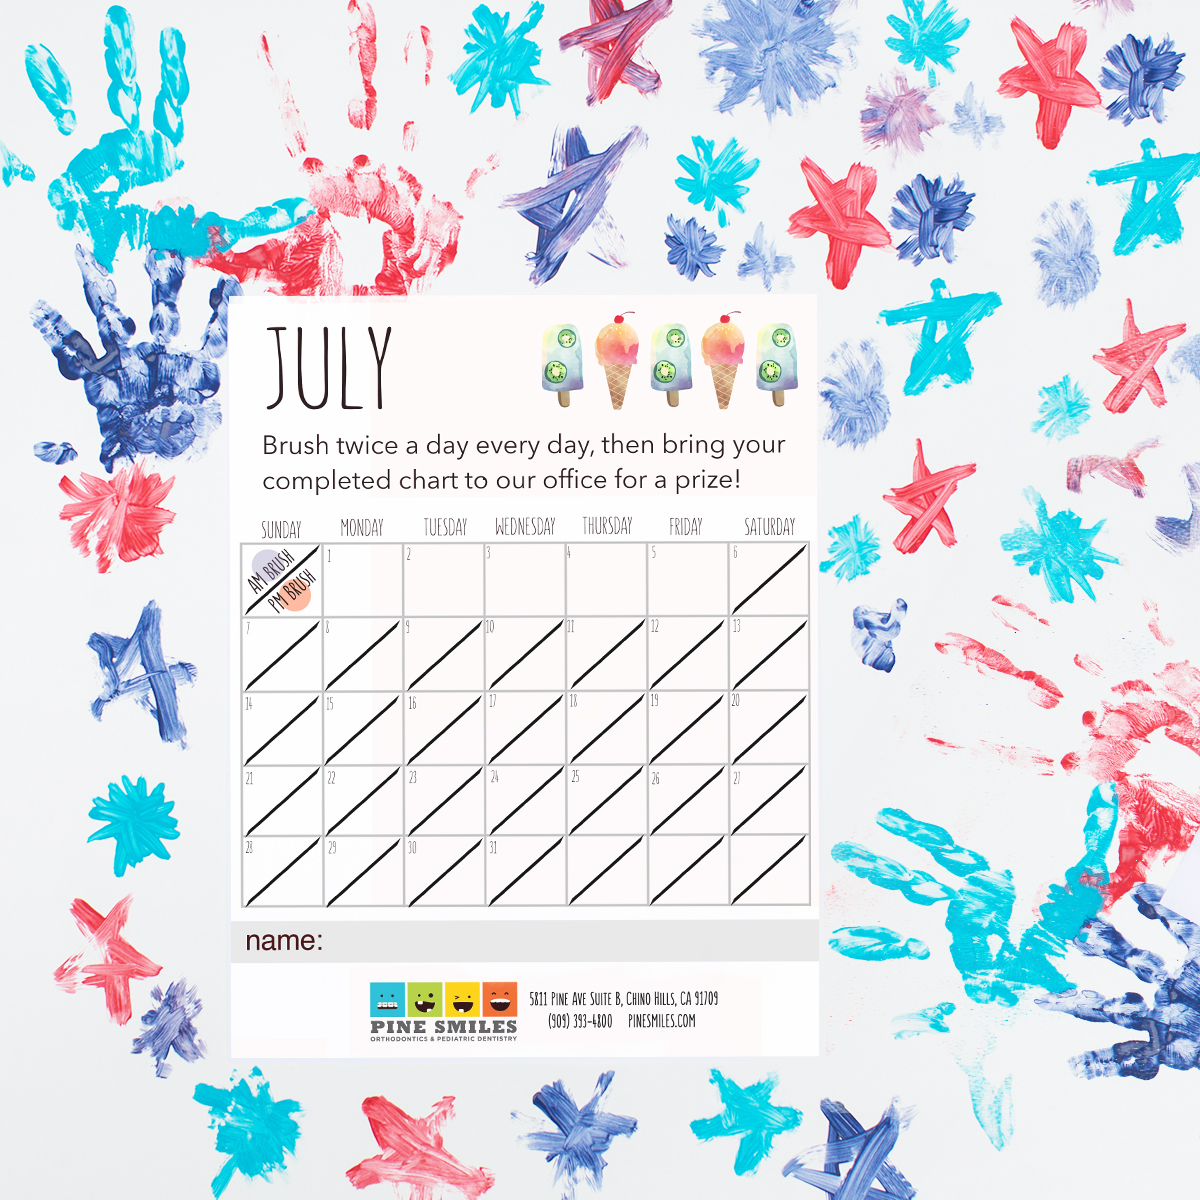 pine july chart image.jpg